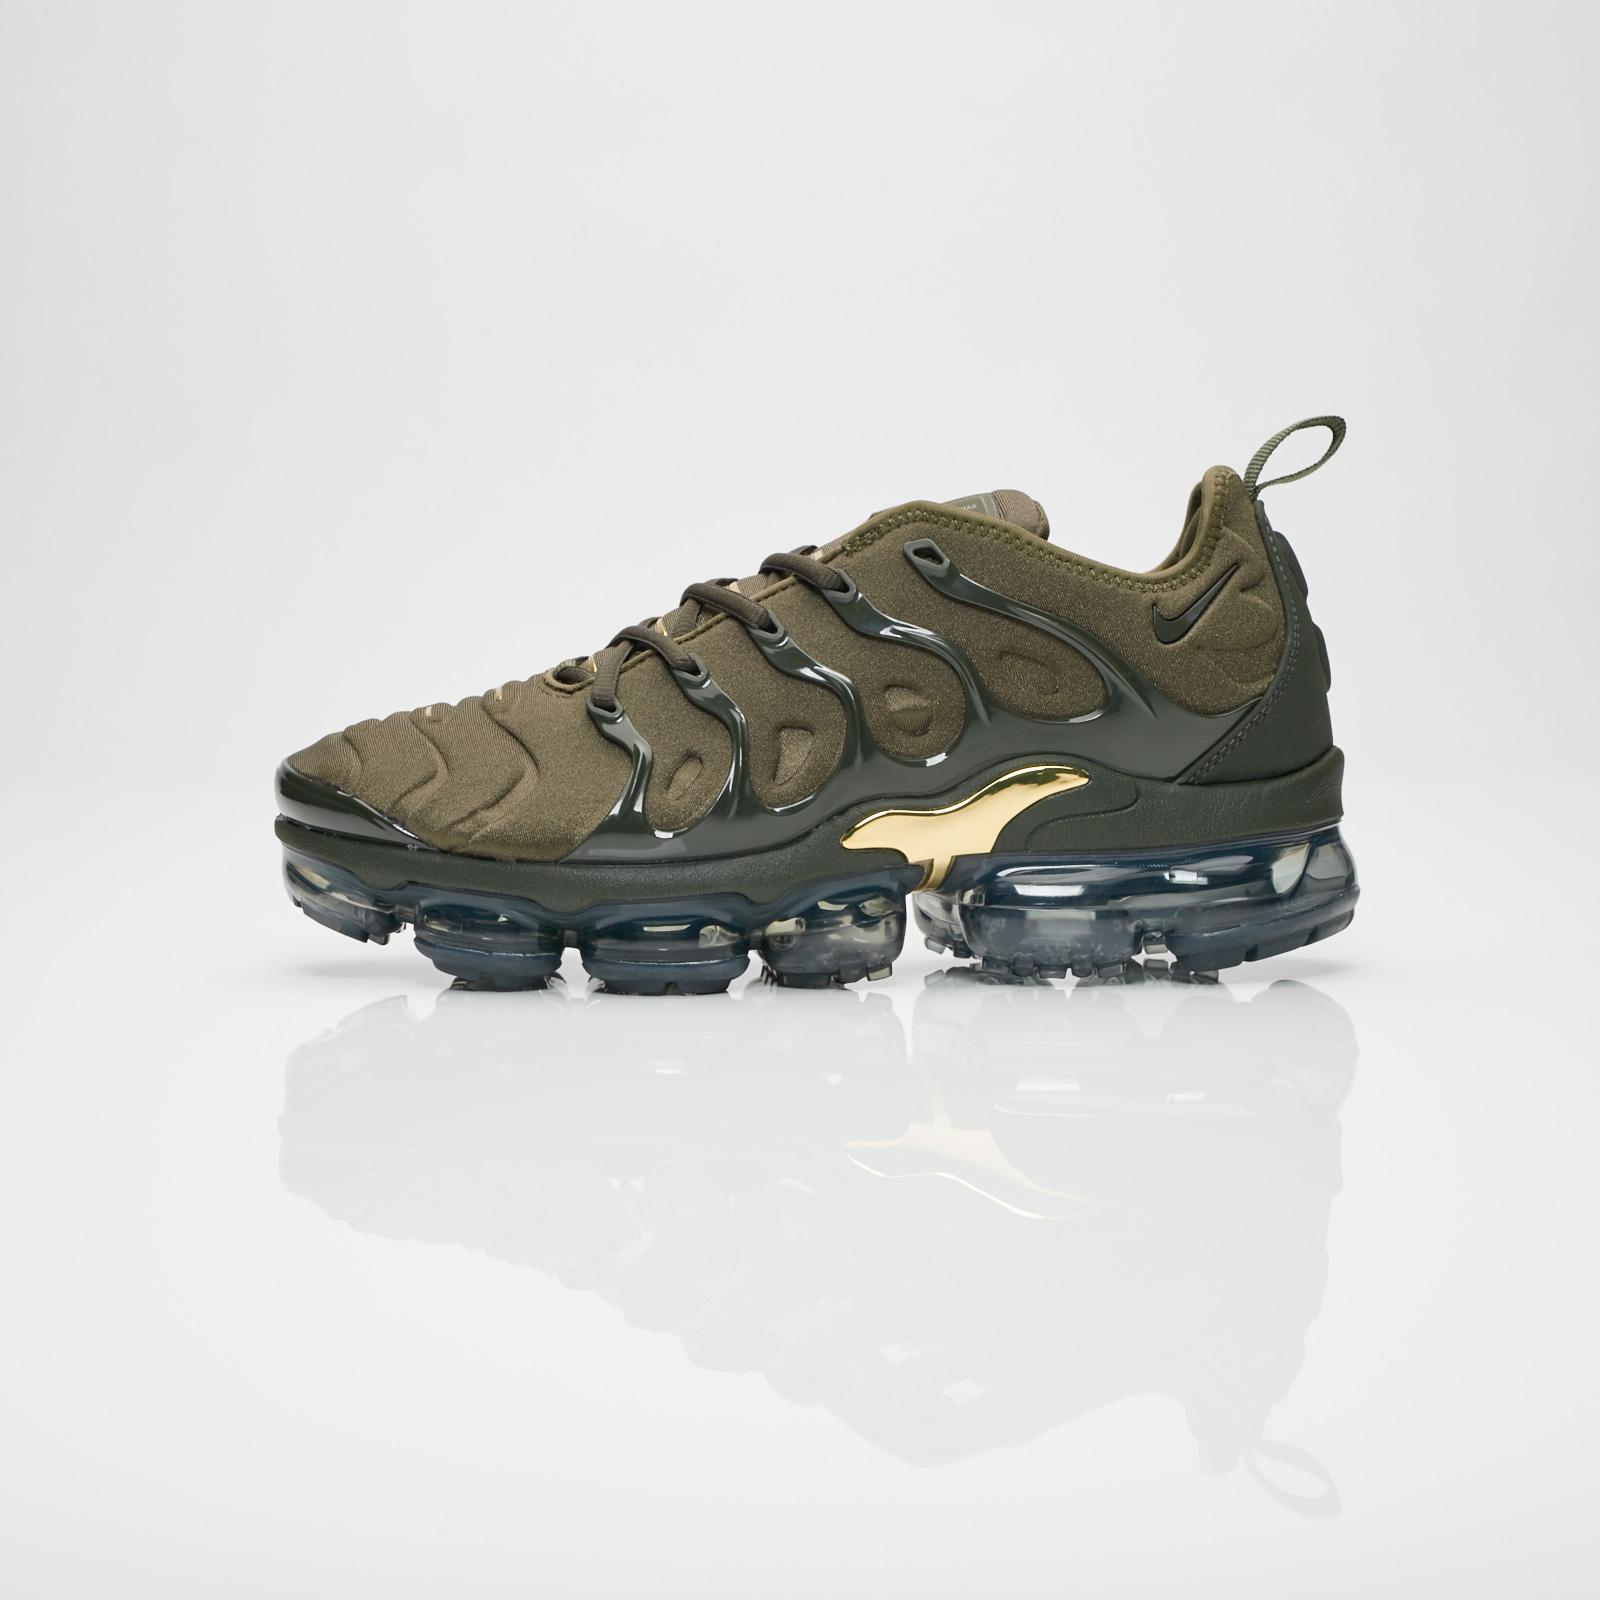 95674ef19ec Nike Air Vapormax Plus - 924453-300 - Sneakersnstuff